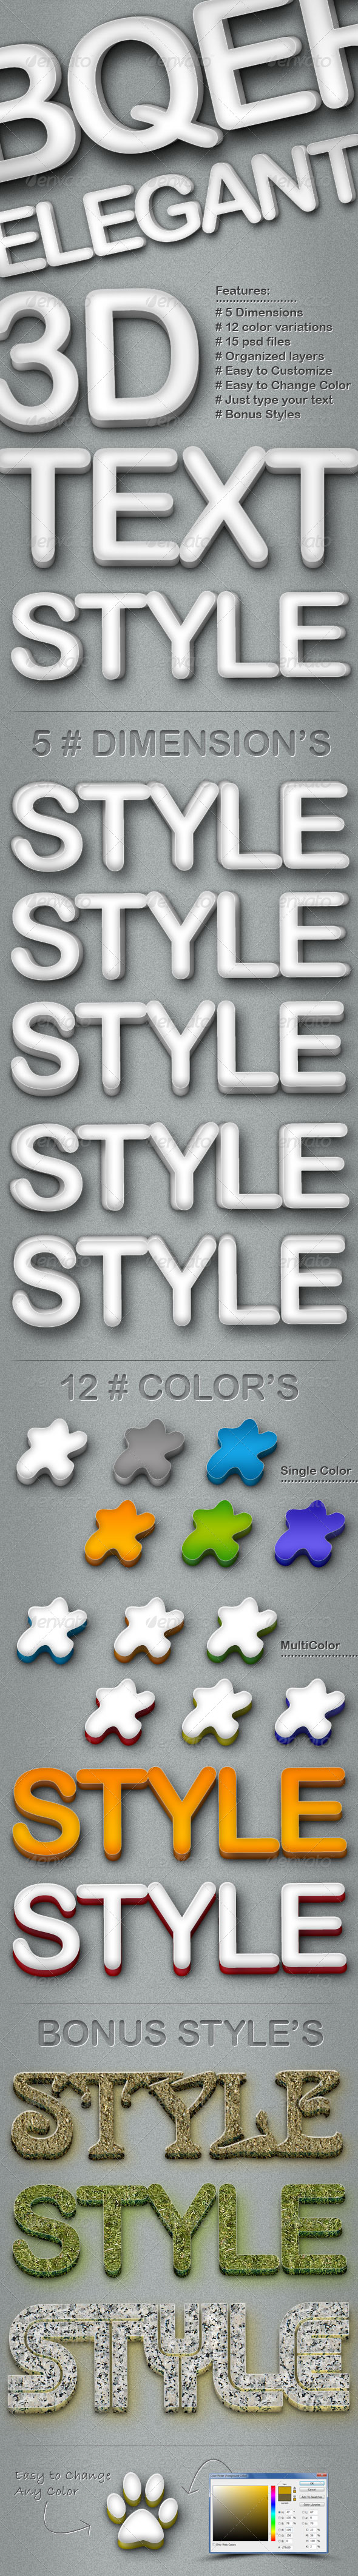 GraphicRiver Elegant 3D Text Style 5 Dimensions 243501